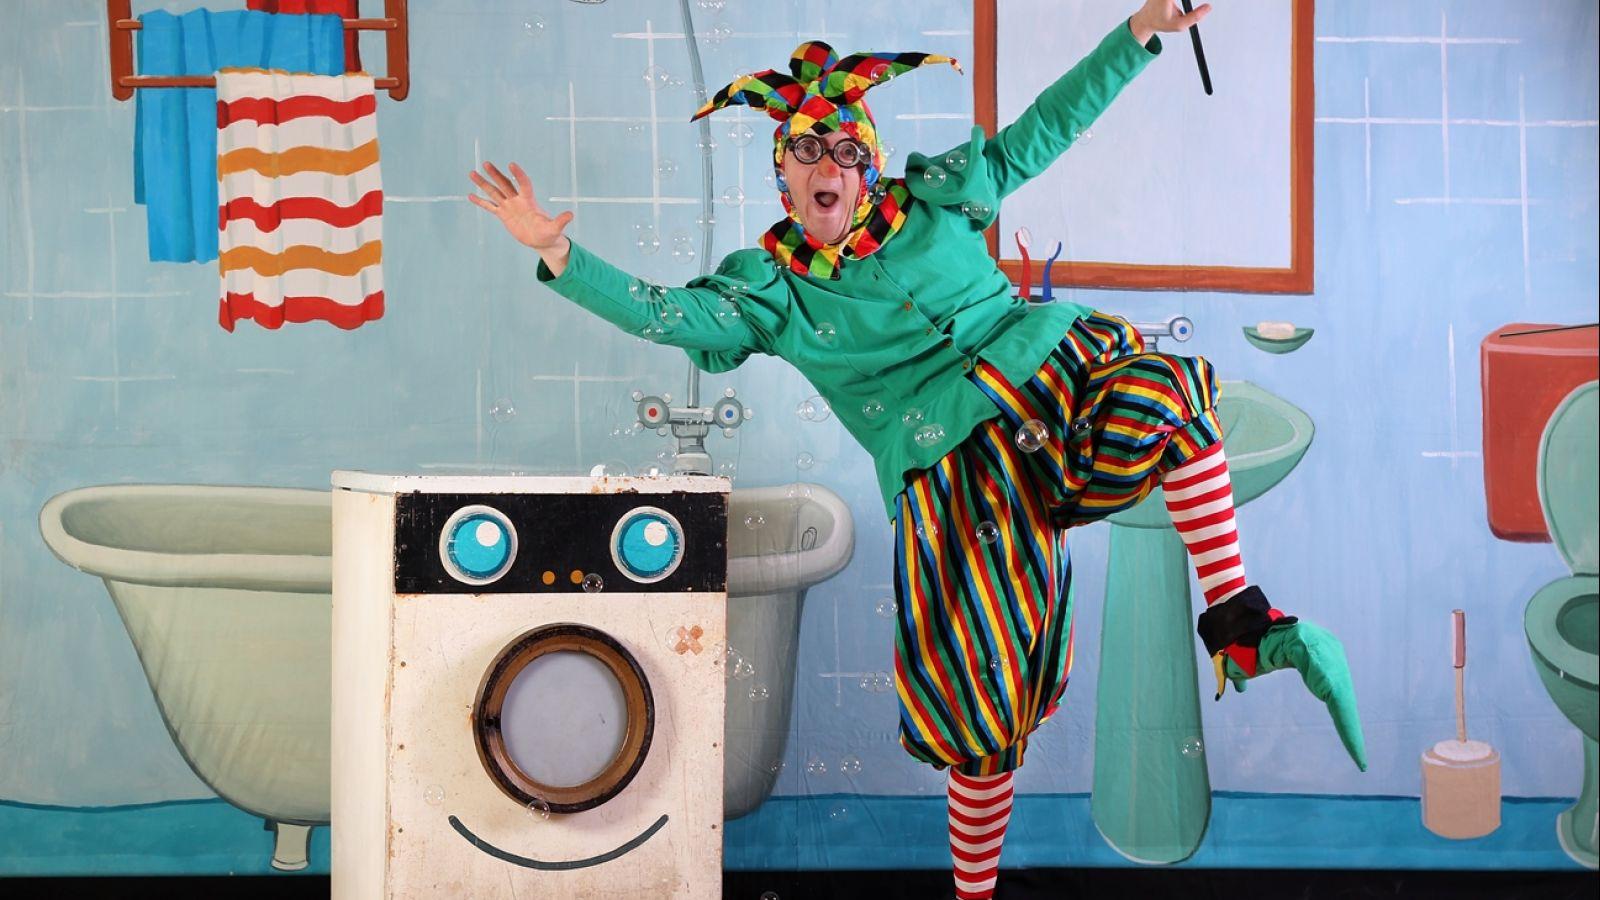 Čudežni pralni stroj